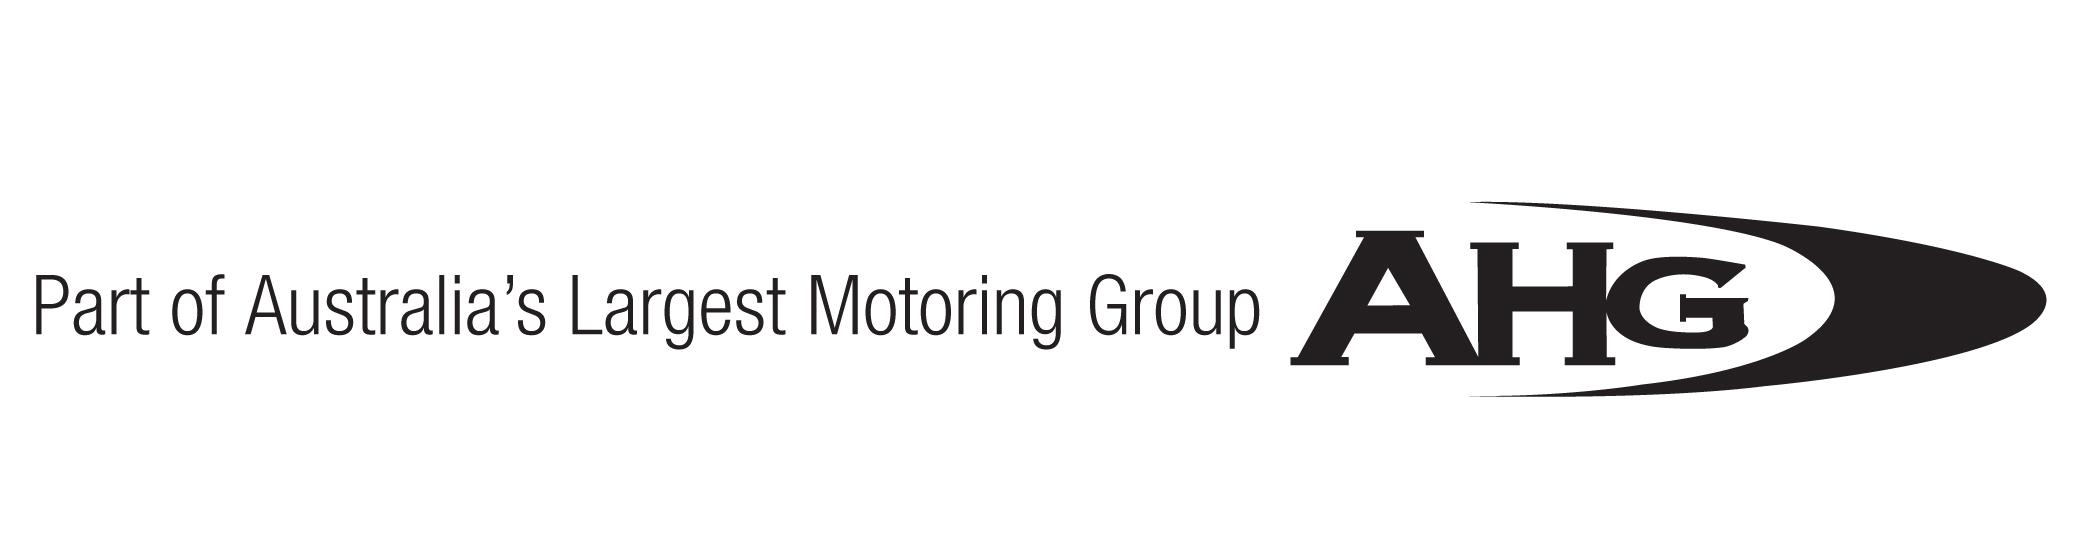 AHG Automotive Holdings Group